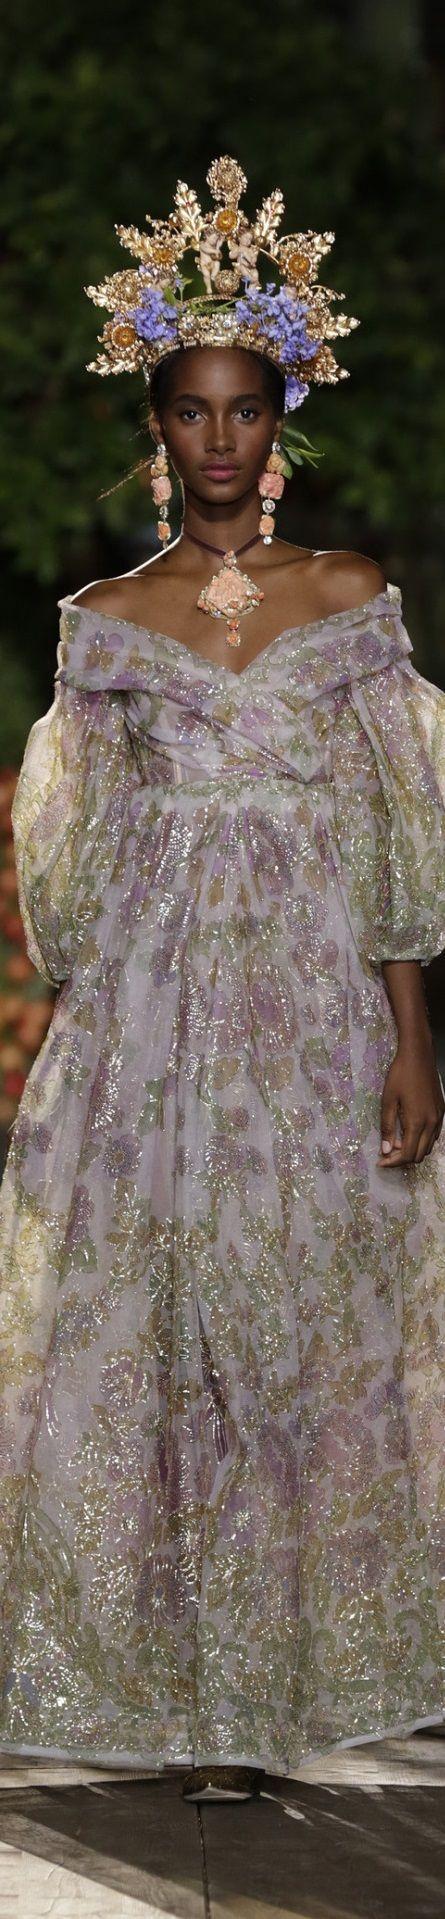 Dolce Gabbana Alta Moda Couture Fall 2015